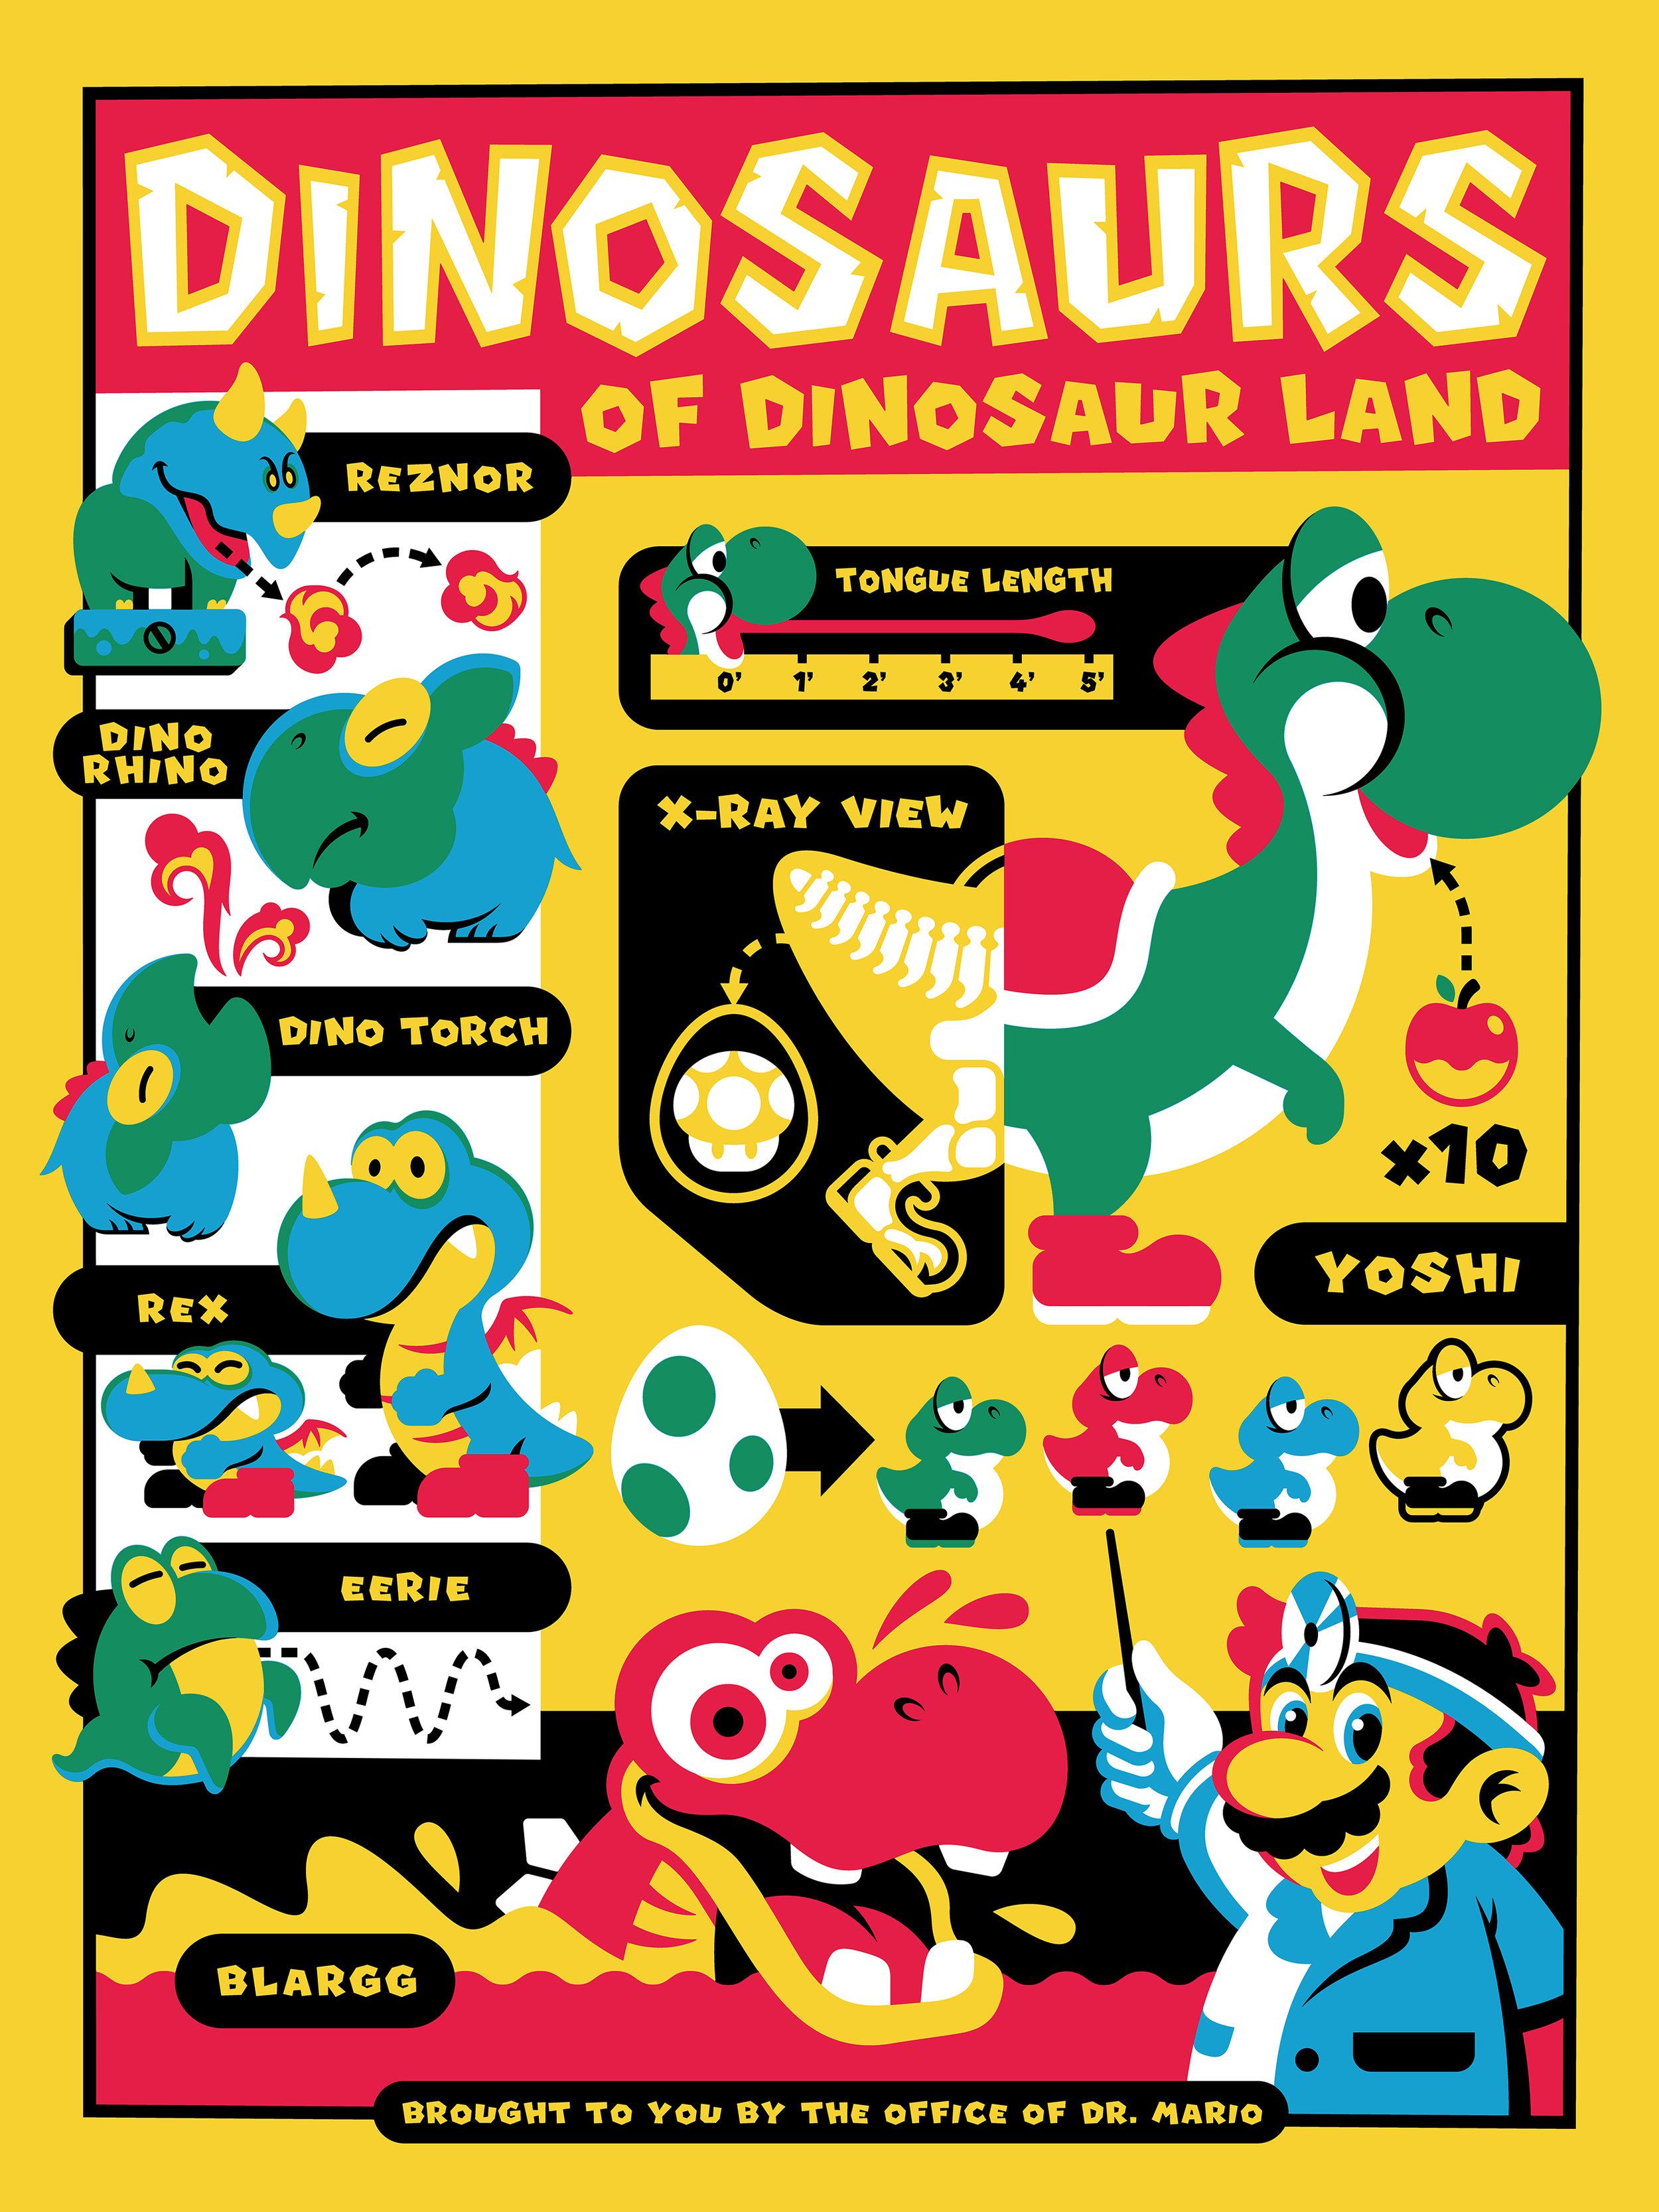 Dinosaurs_of_Dinosaur_Land_image.jpg